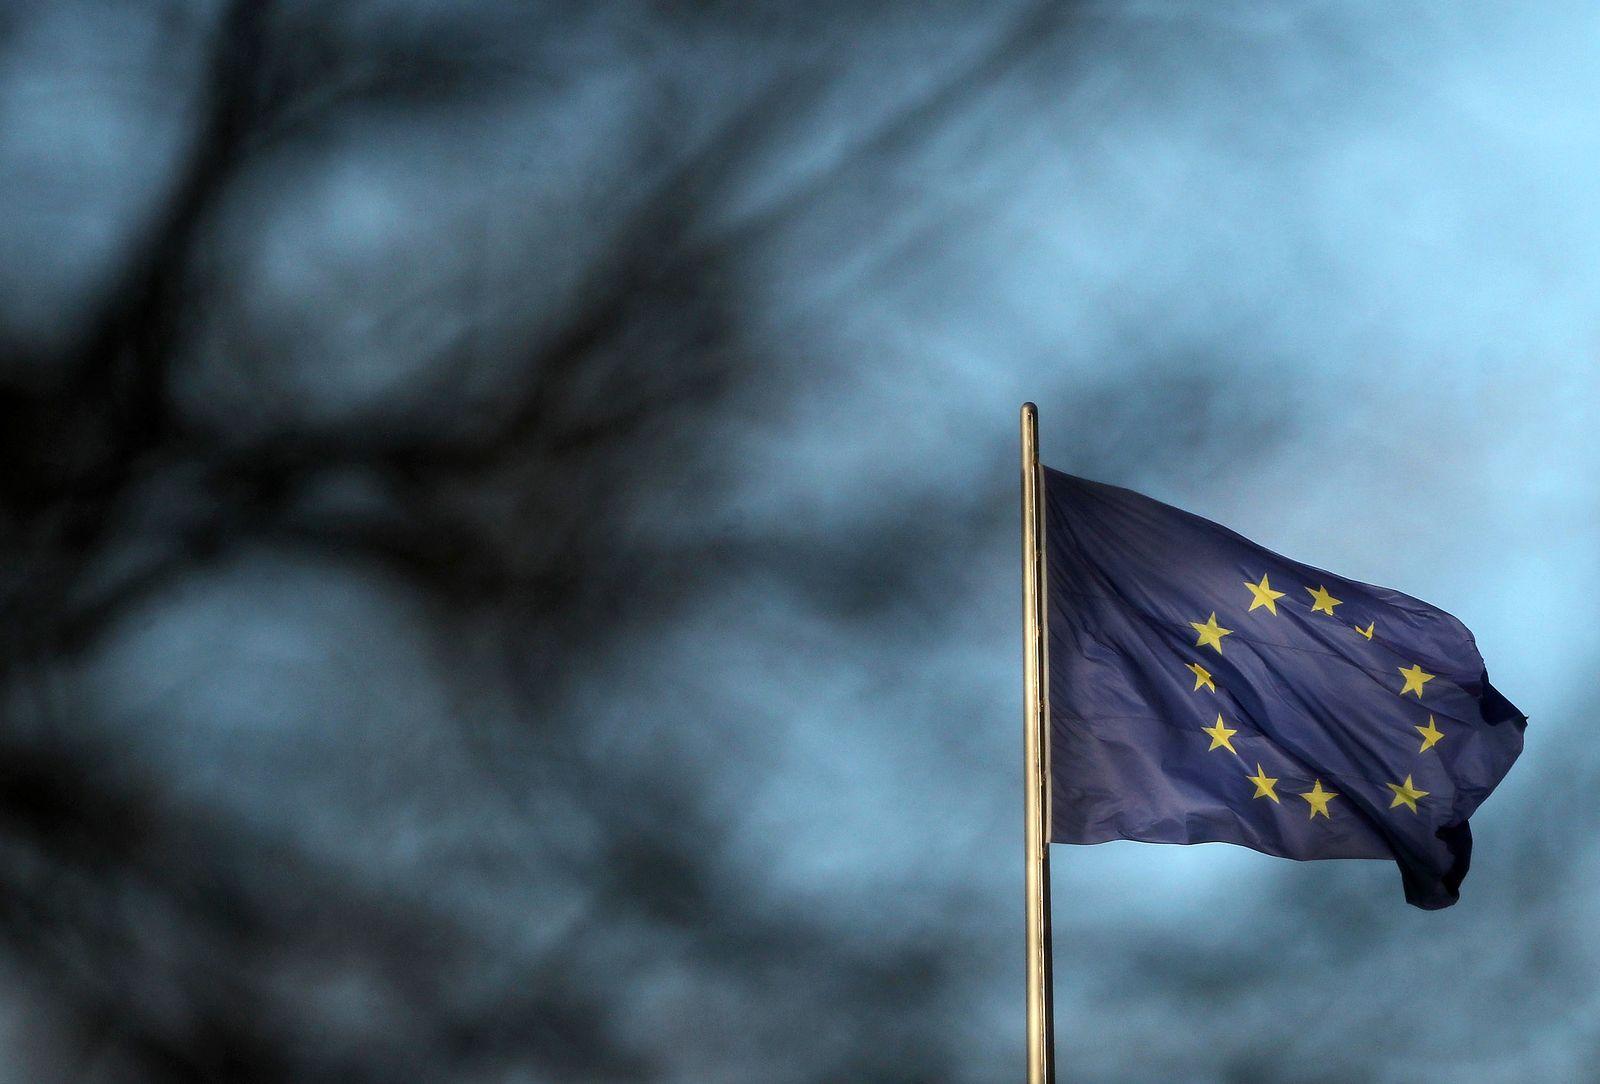 Euro-Krise / Europa Finanz-Krise